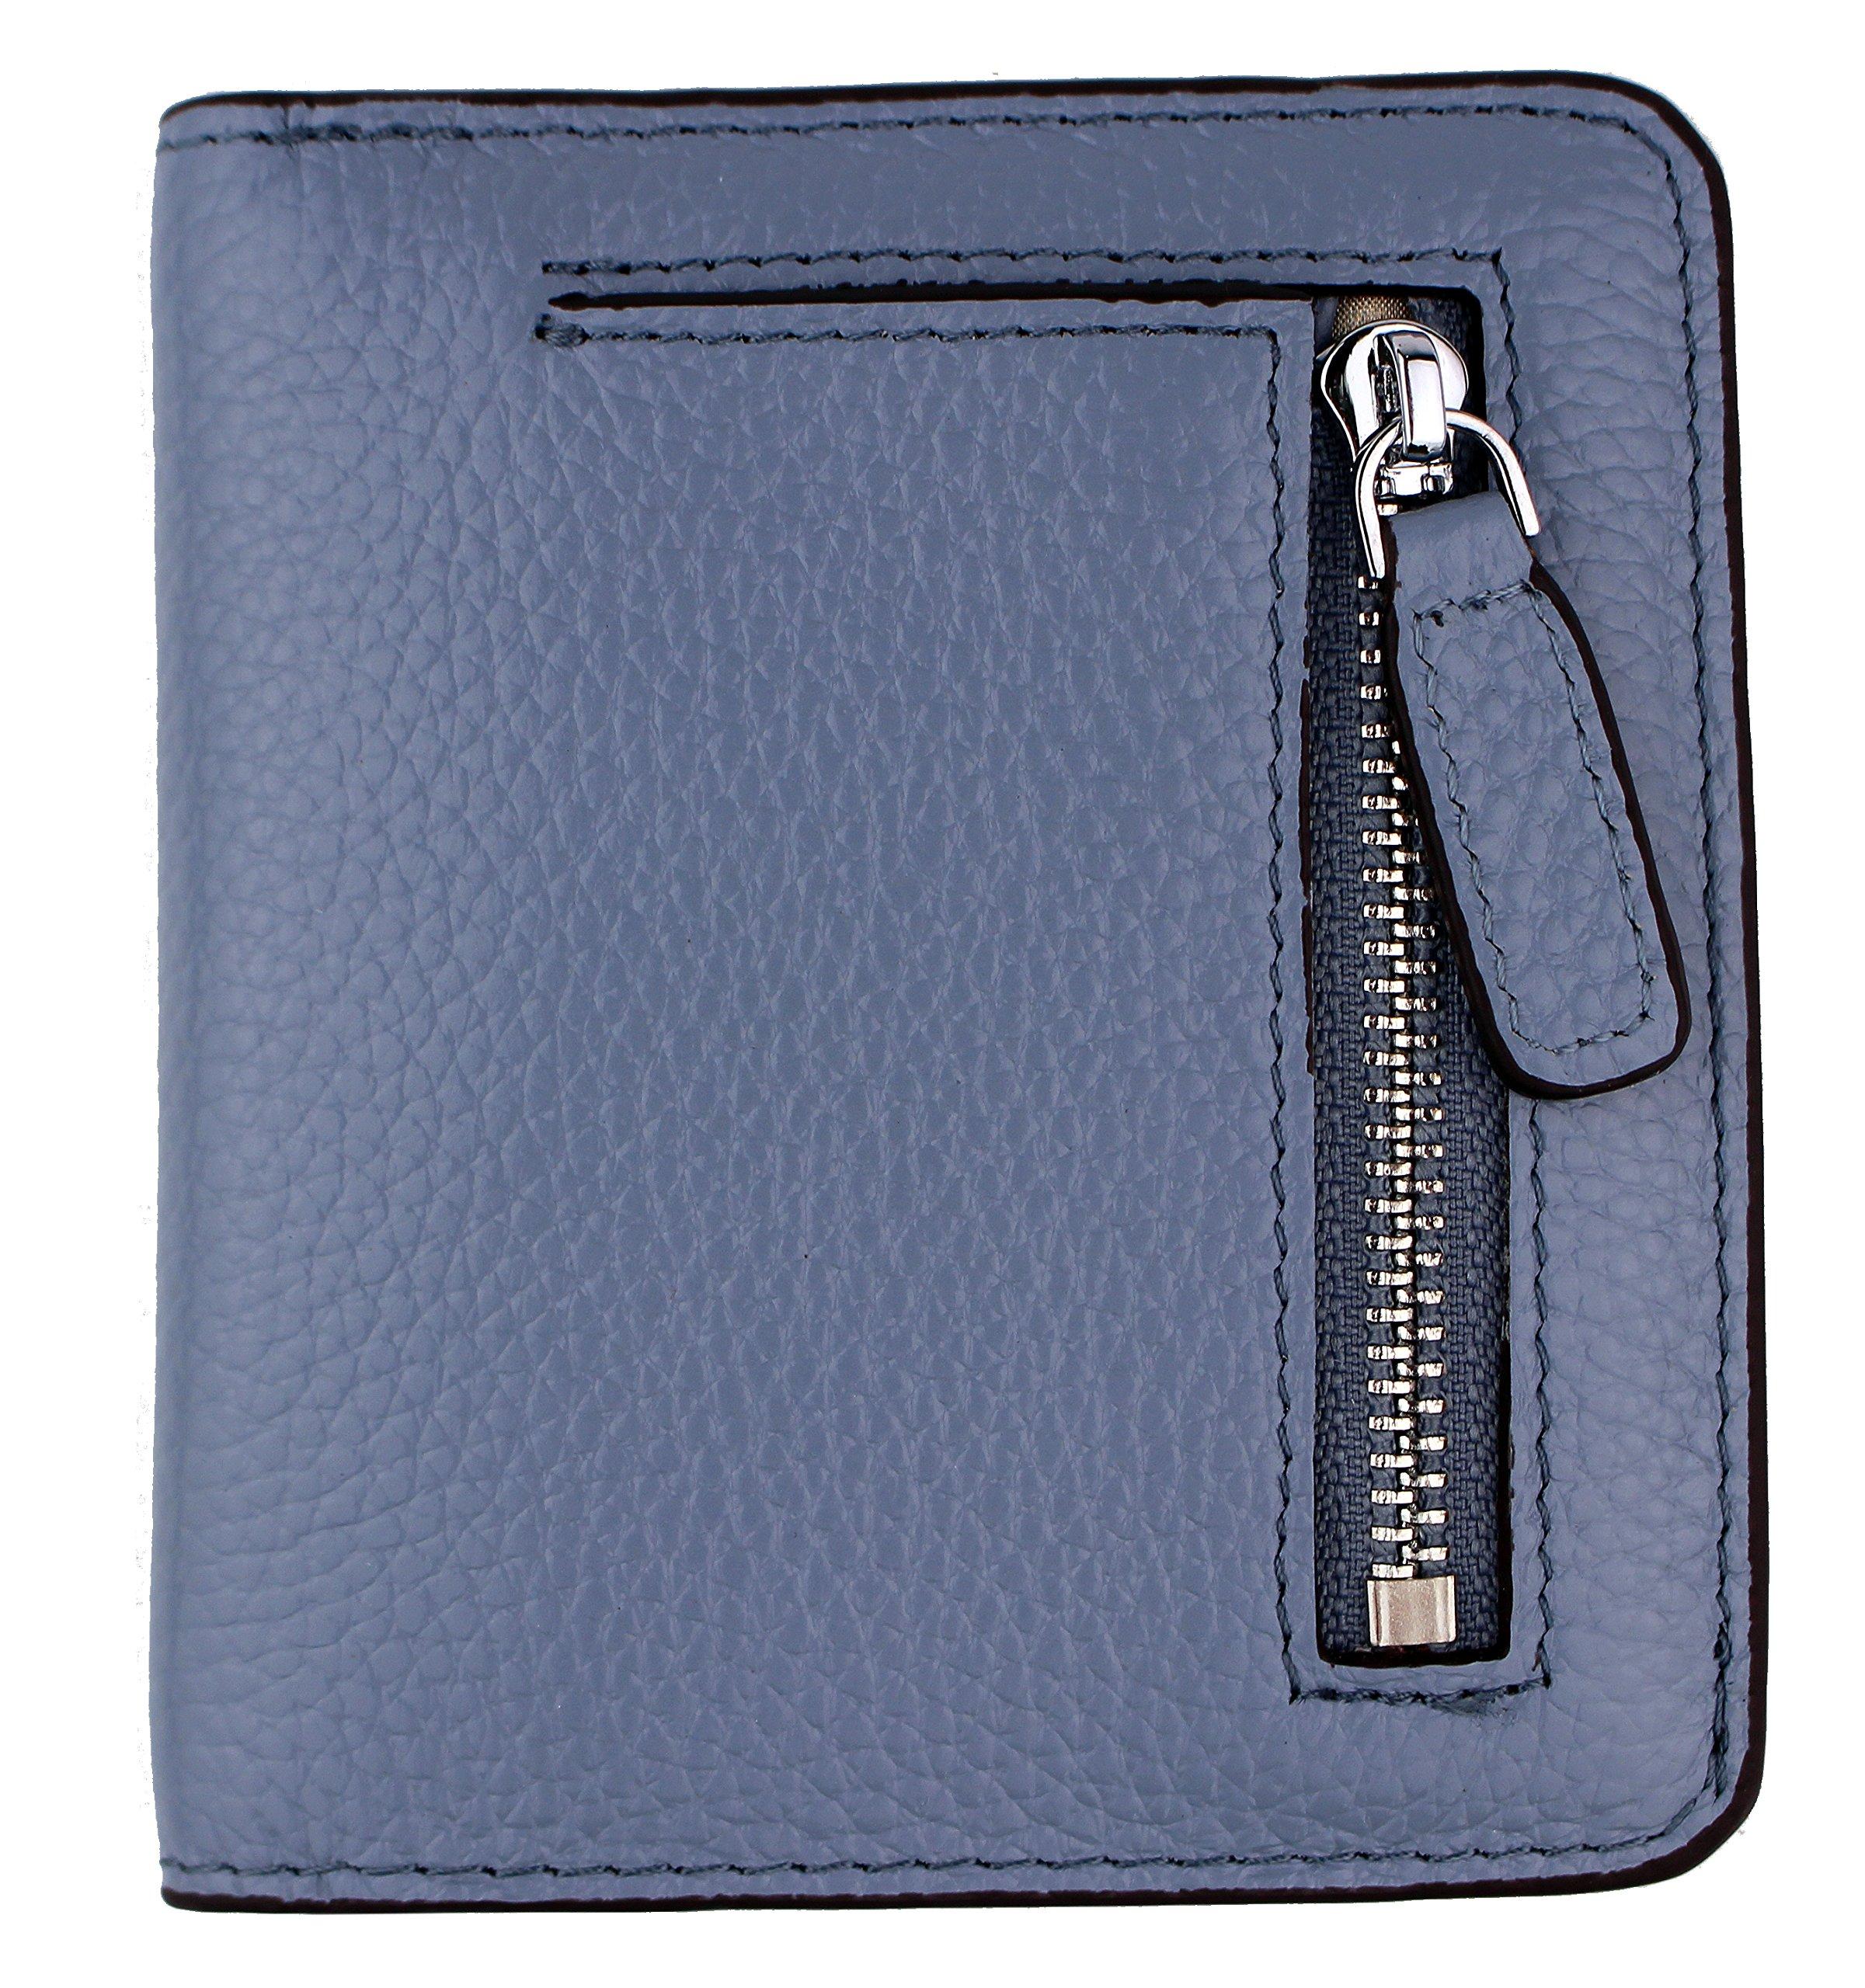 Women's RFID Blocking Small Genuine Leather Wallet Ladies Mini Card Case Purse (Gray Blue)